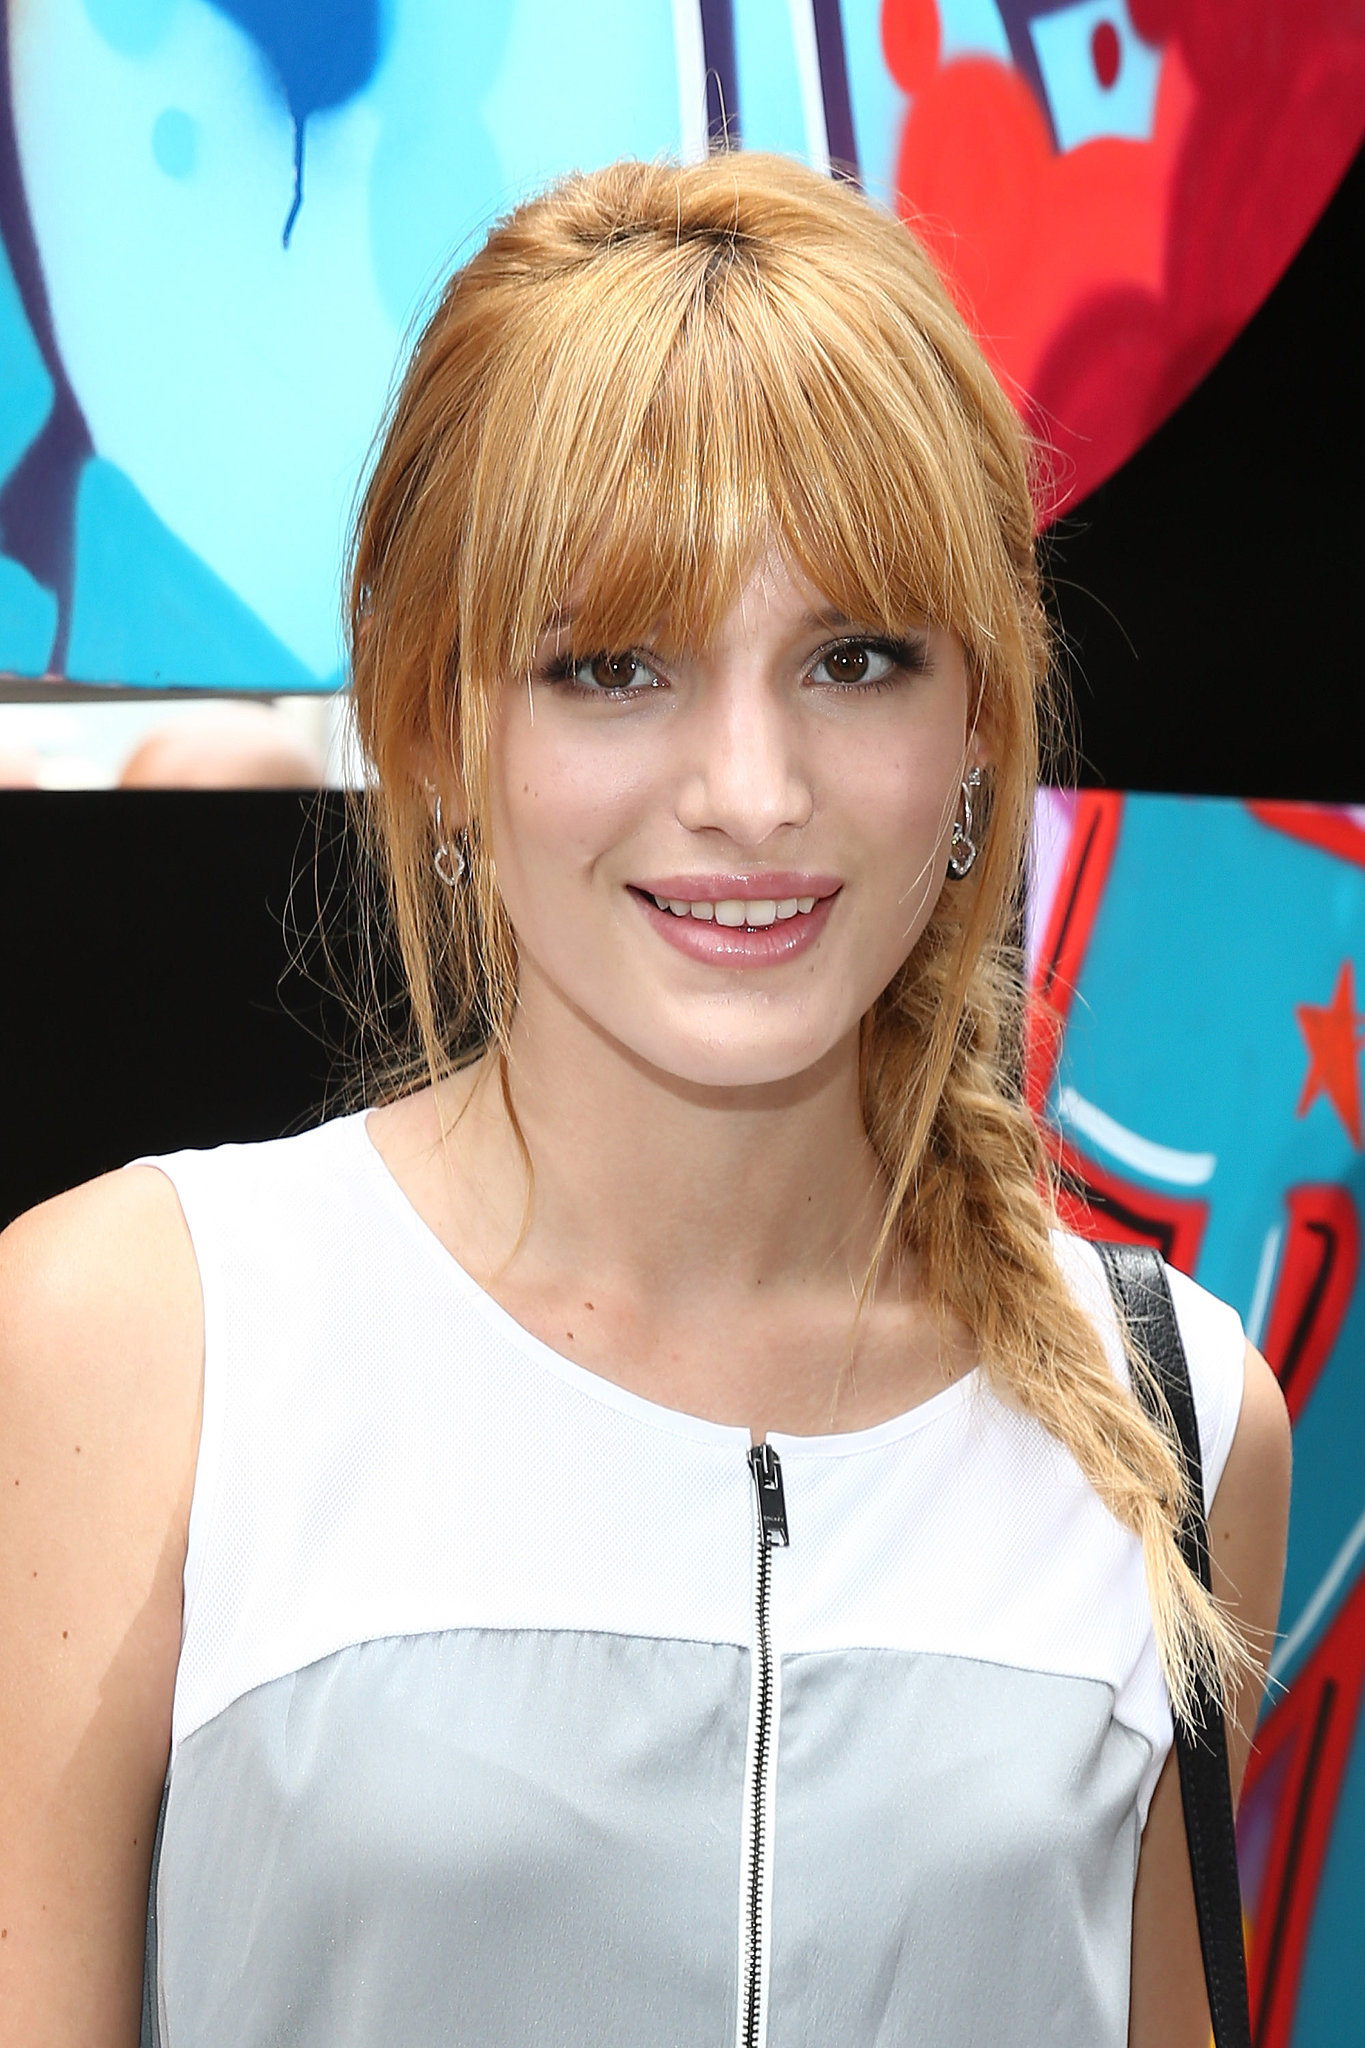 Bella Thorne at DKNY Spring 2014.